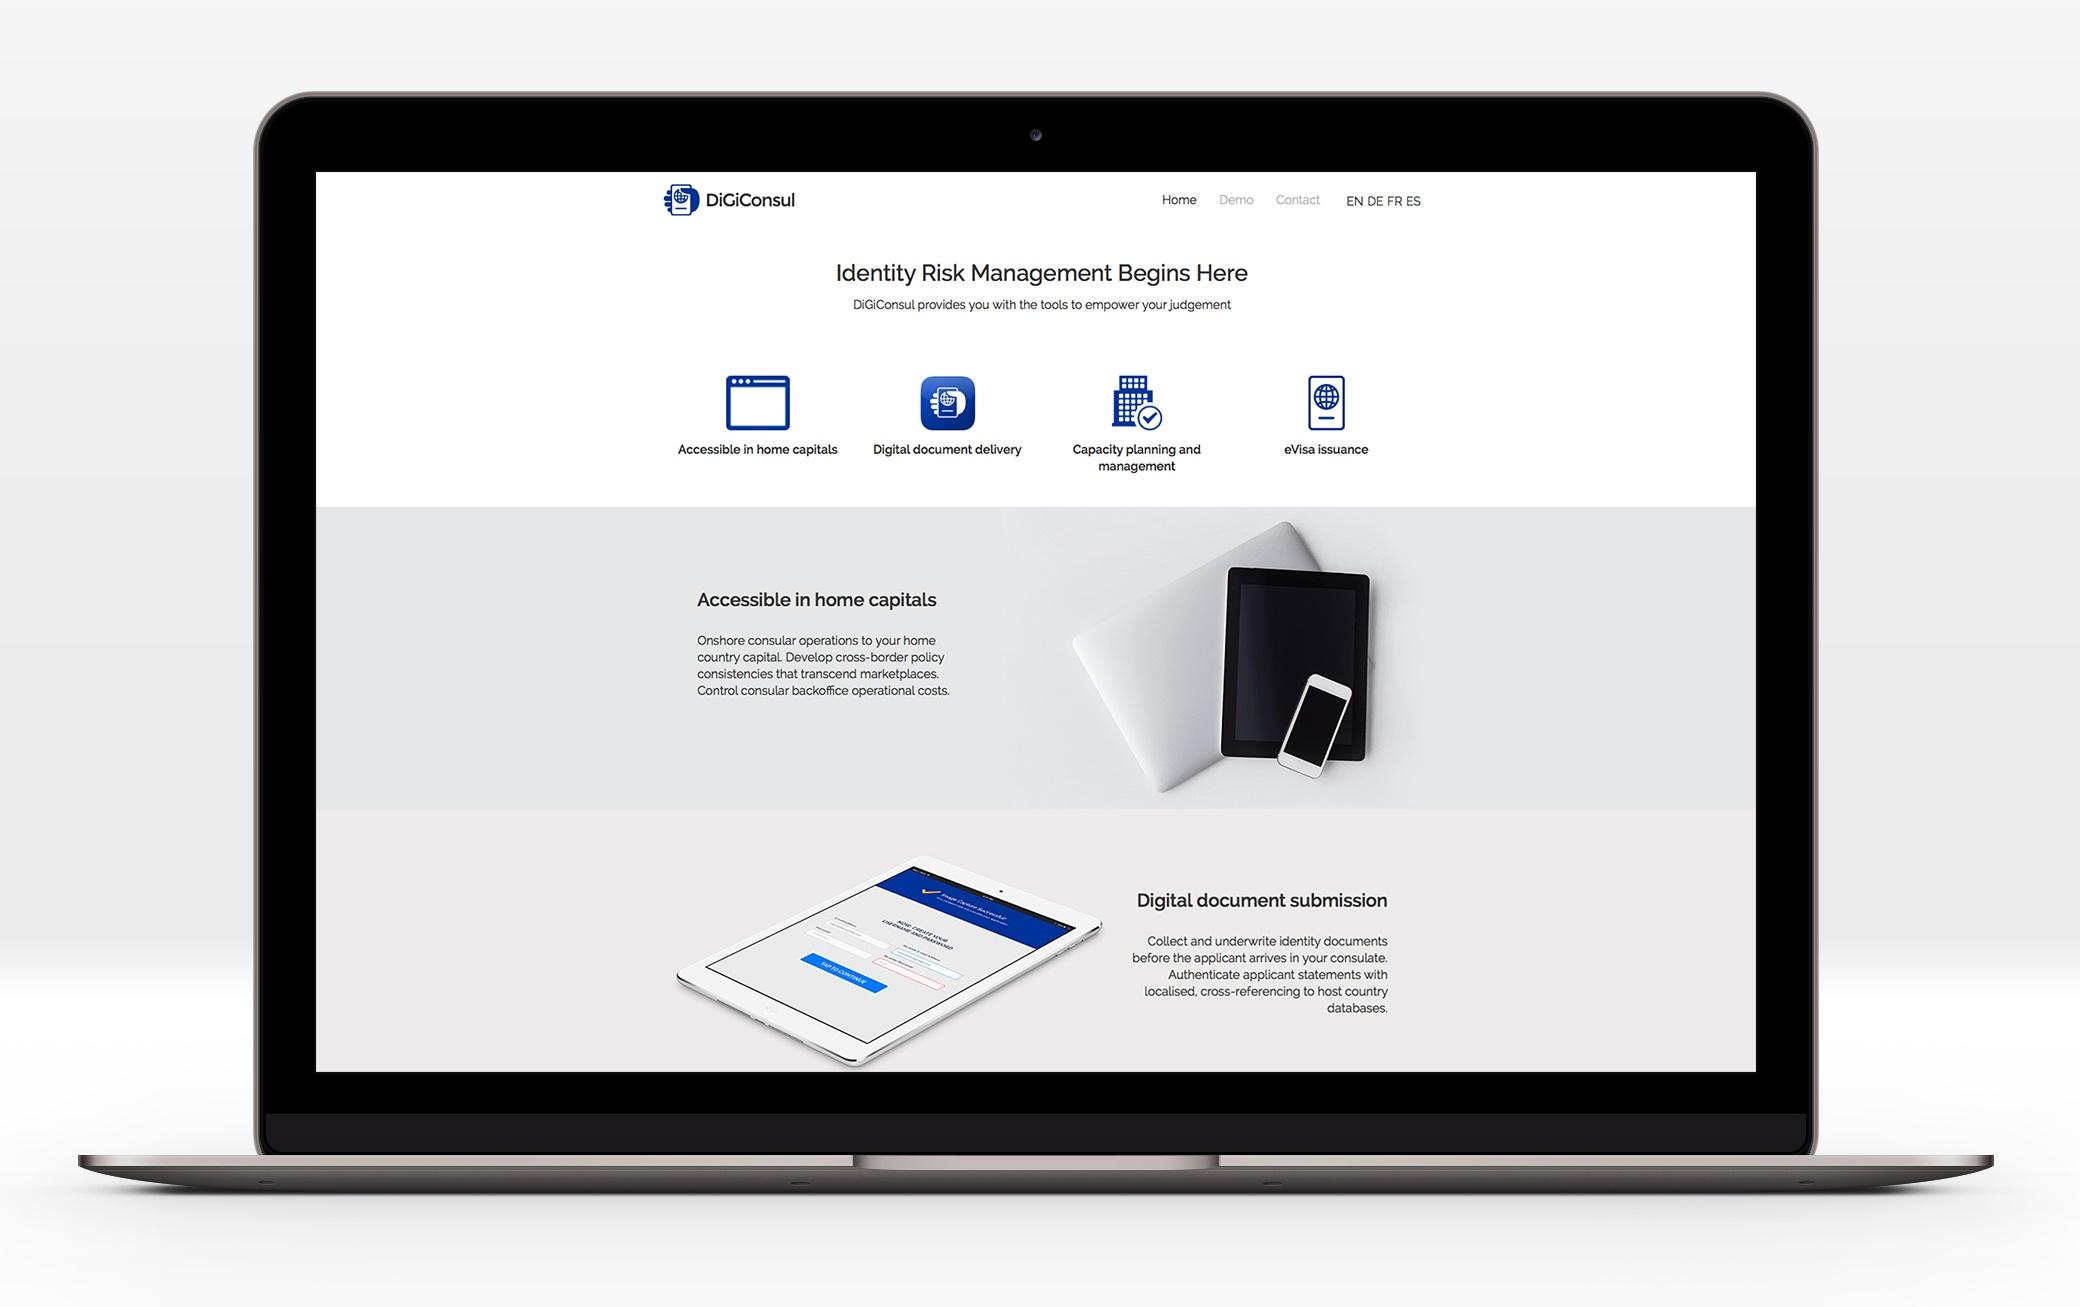 Digiconsul presentation website roweb for Mongodb consul